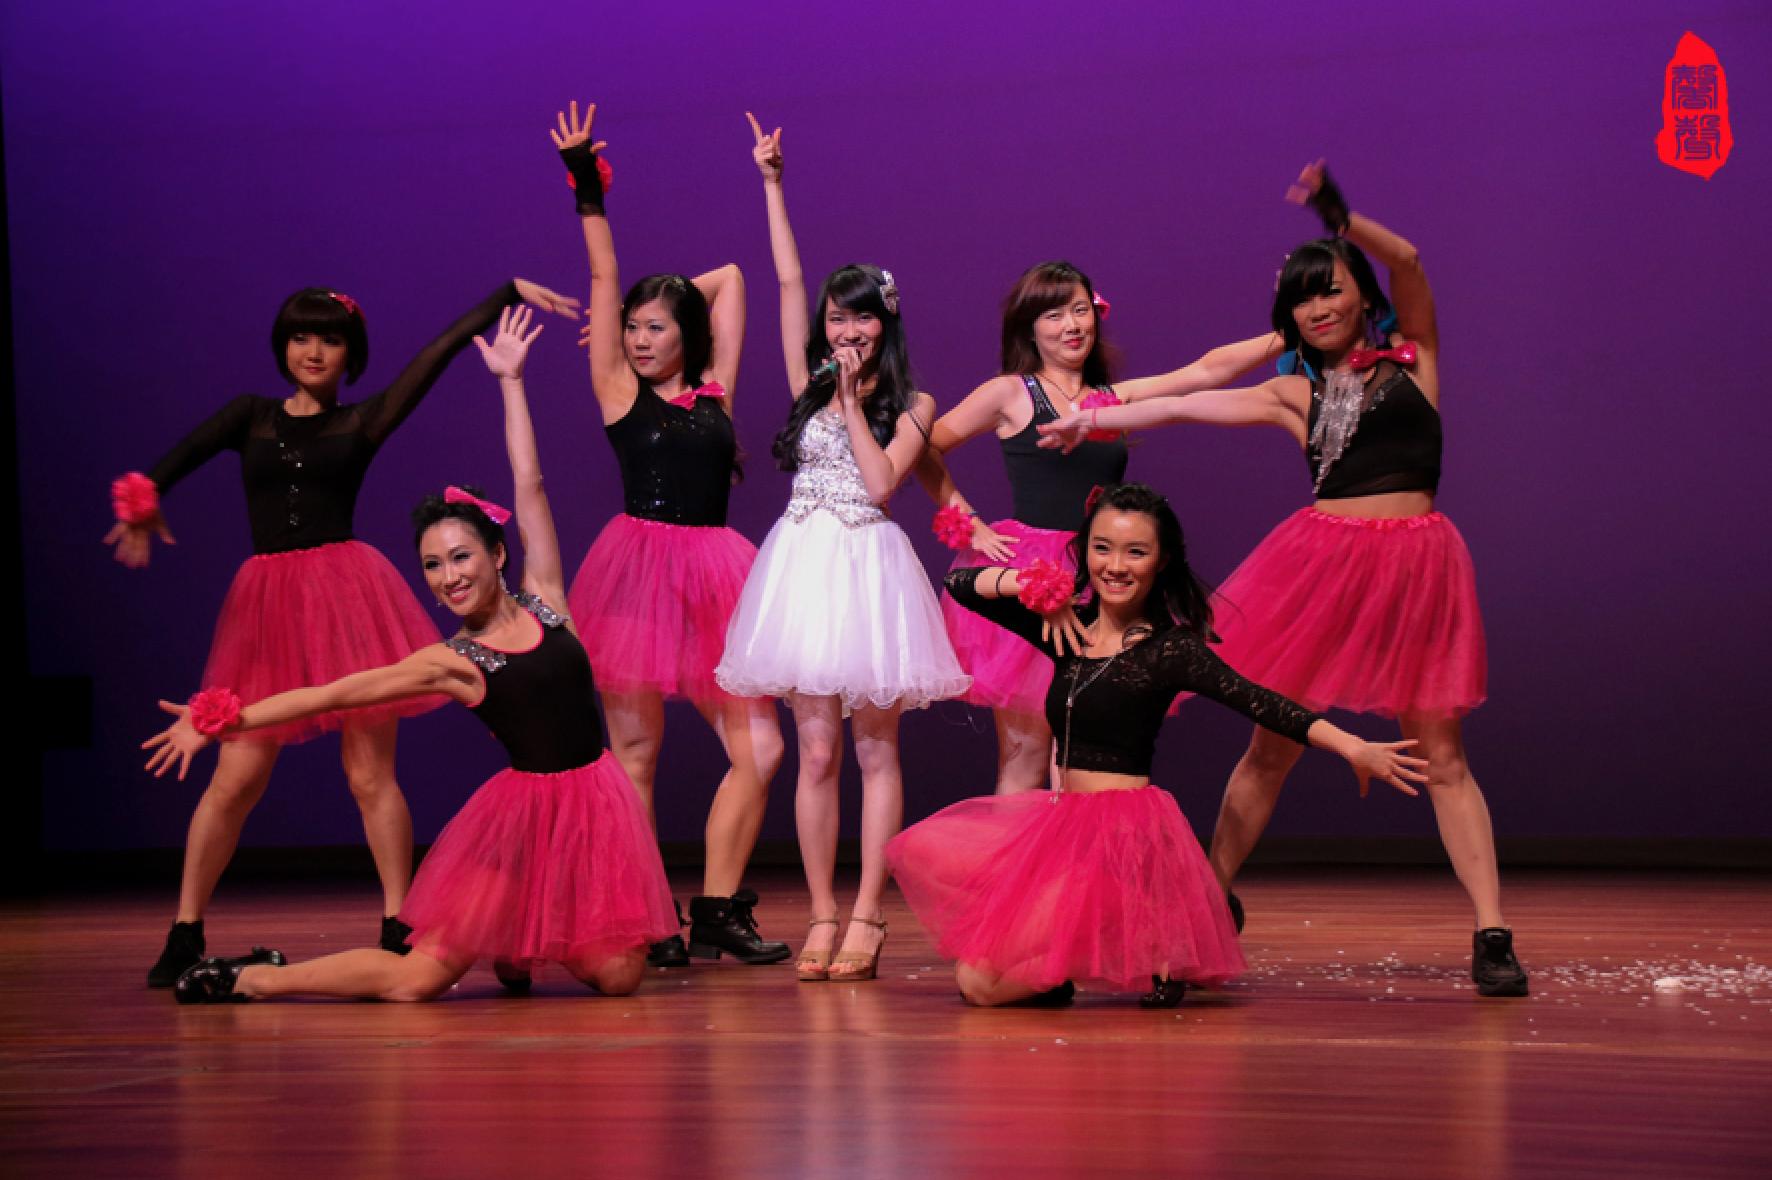 Broadway Jazz choreography